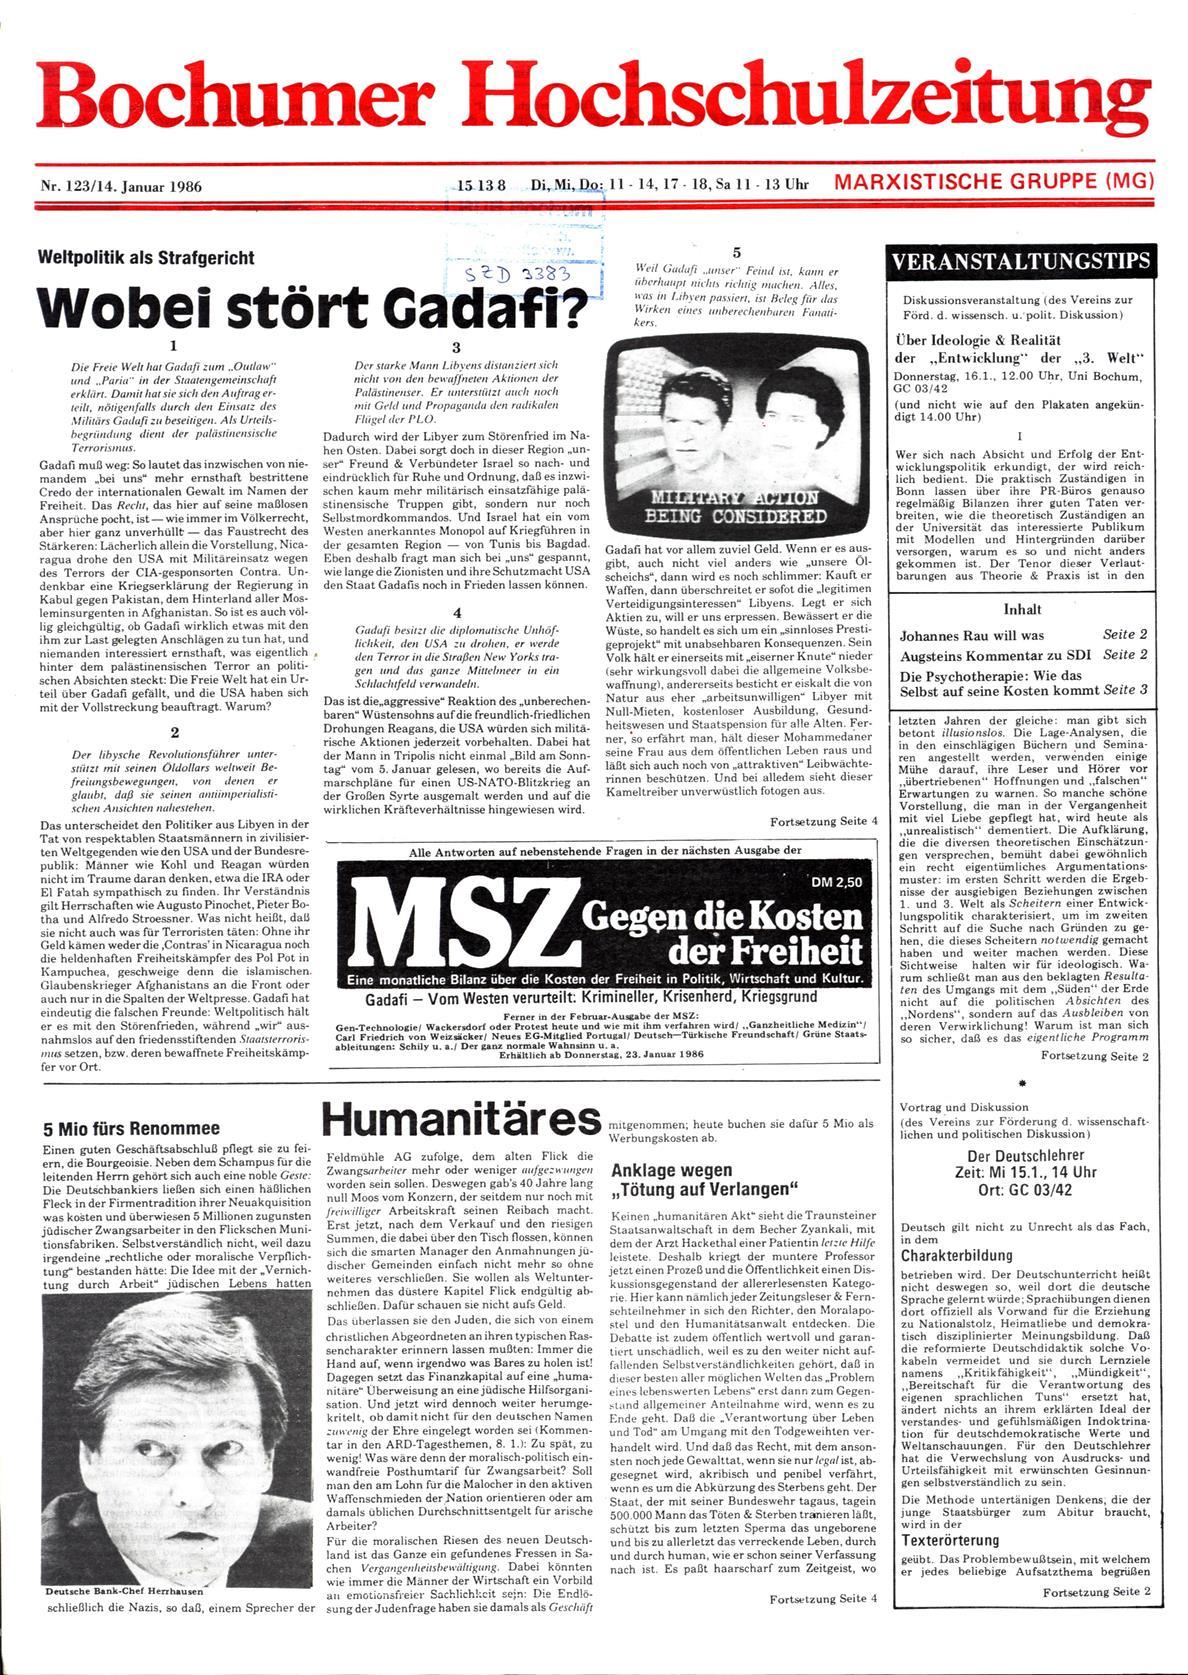 Bochum_BHZ_19860114_123_001